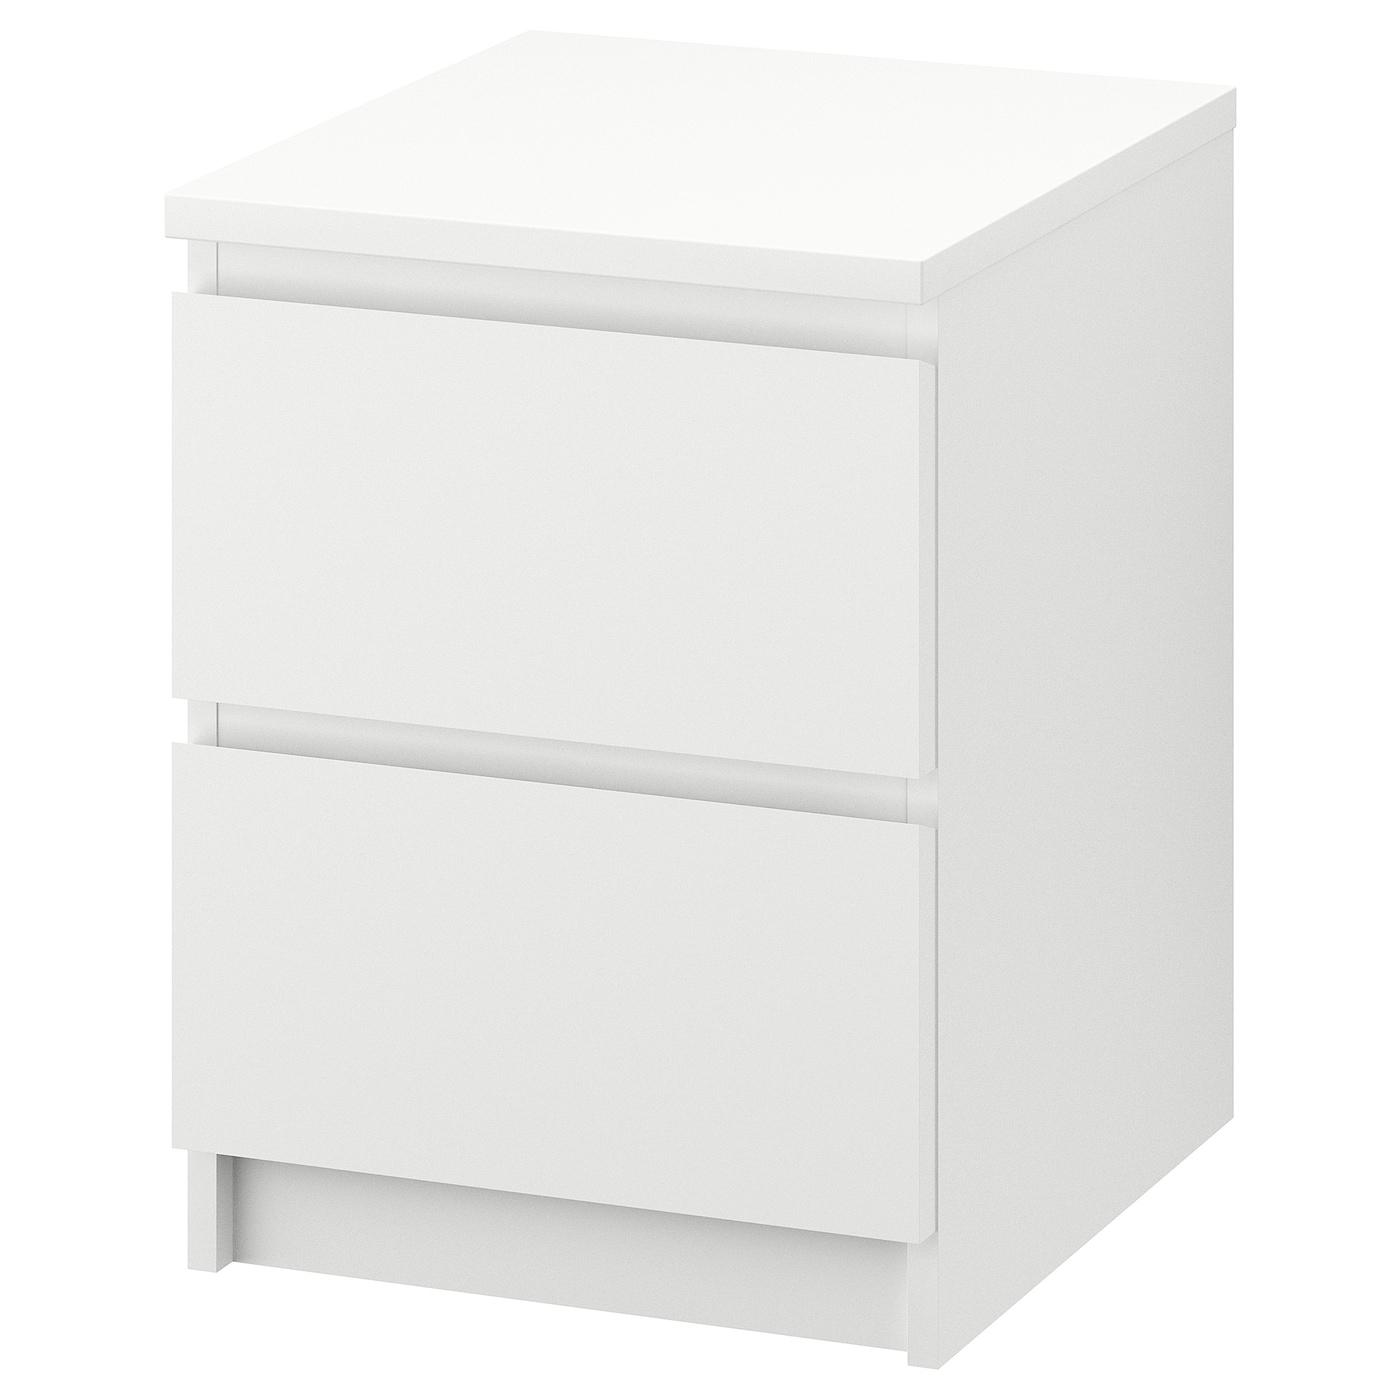 malm serie ikea. Black Bedroom Furniture Sets. Home Design Ideas